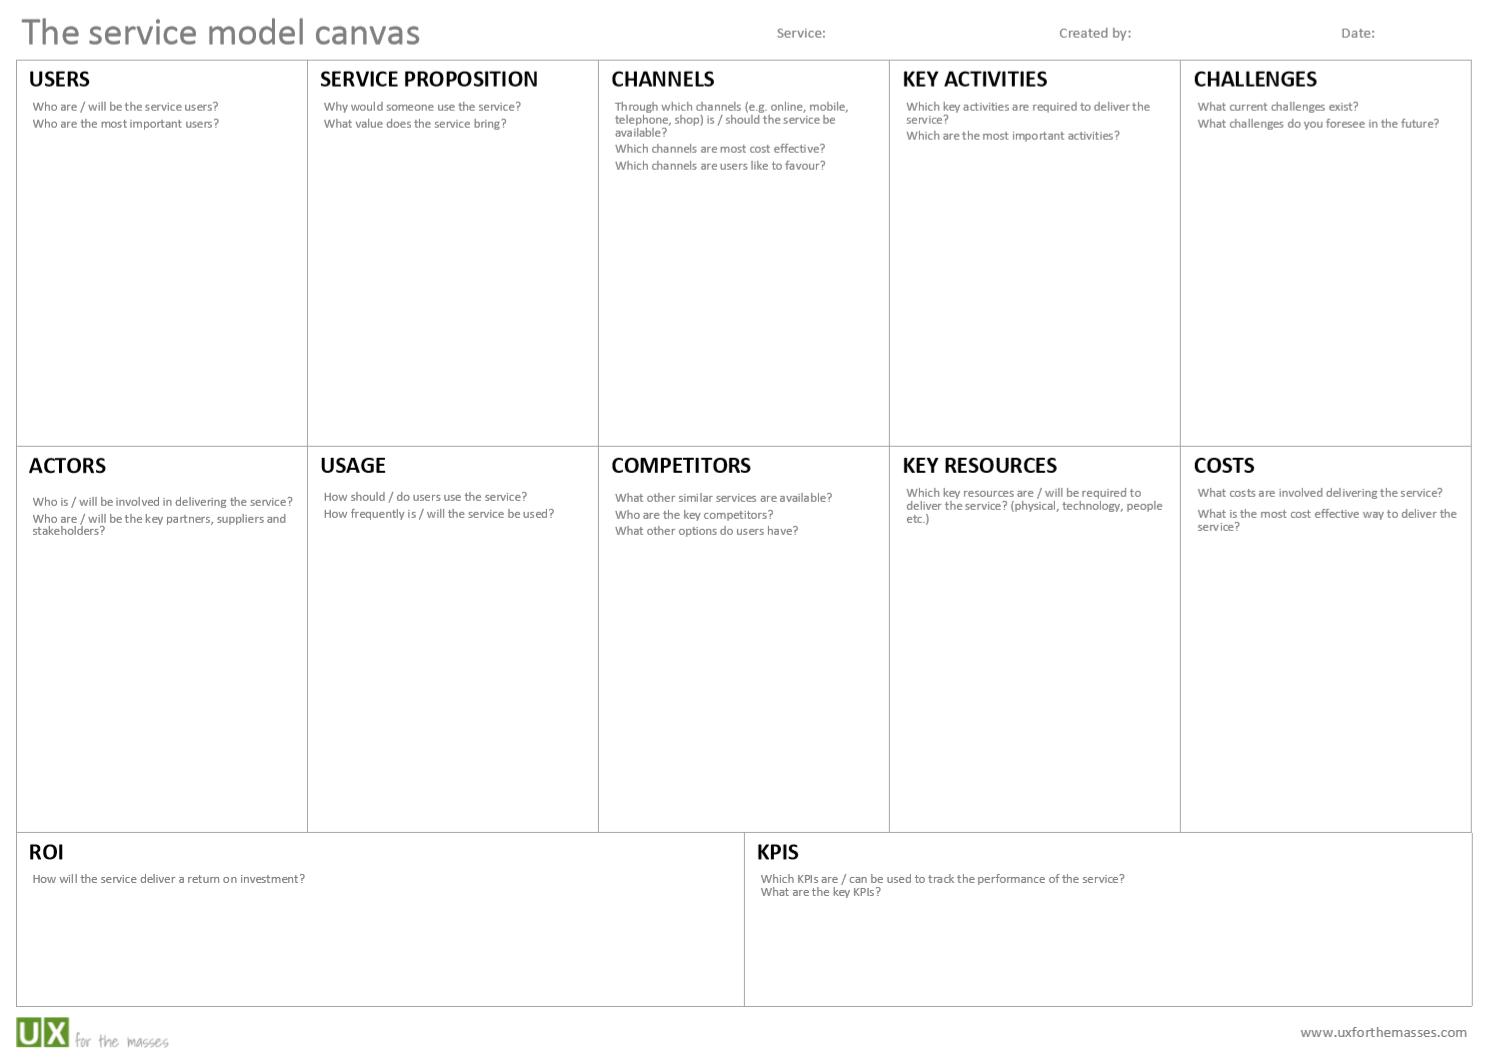 Service Model Canvas